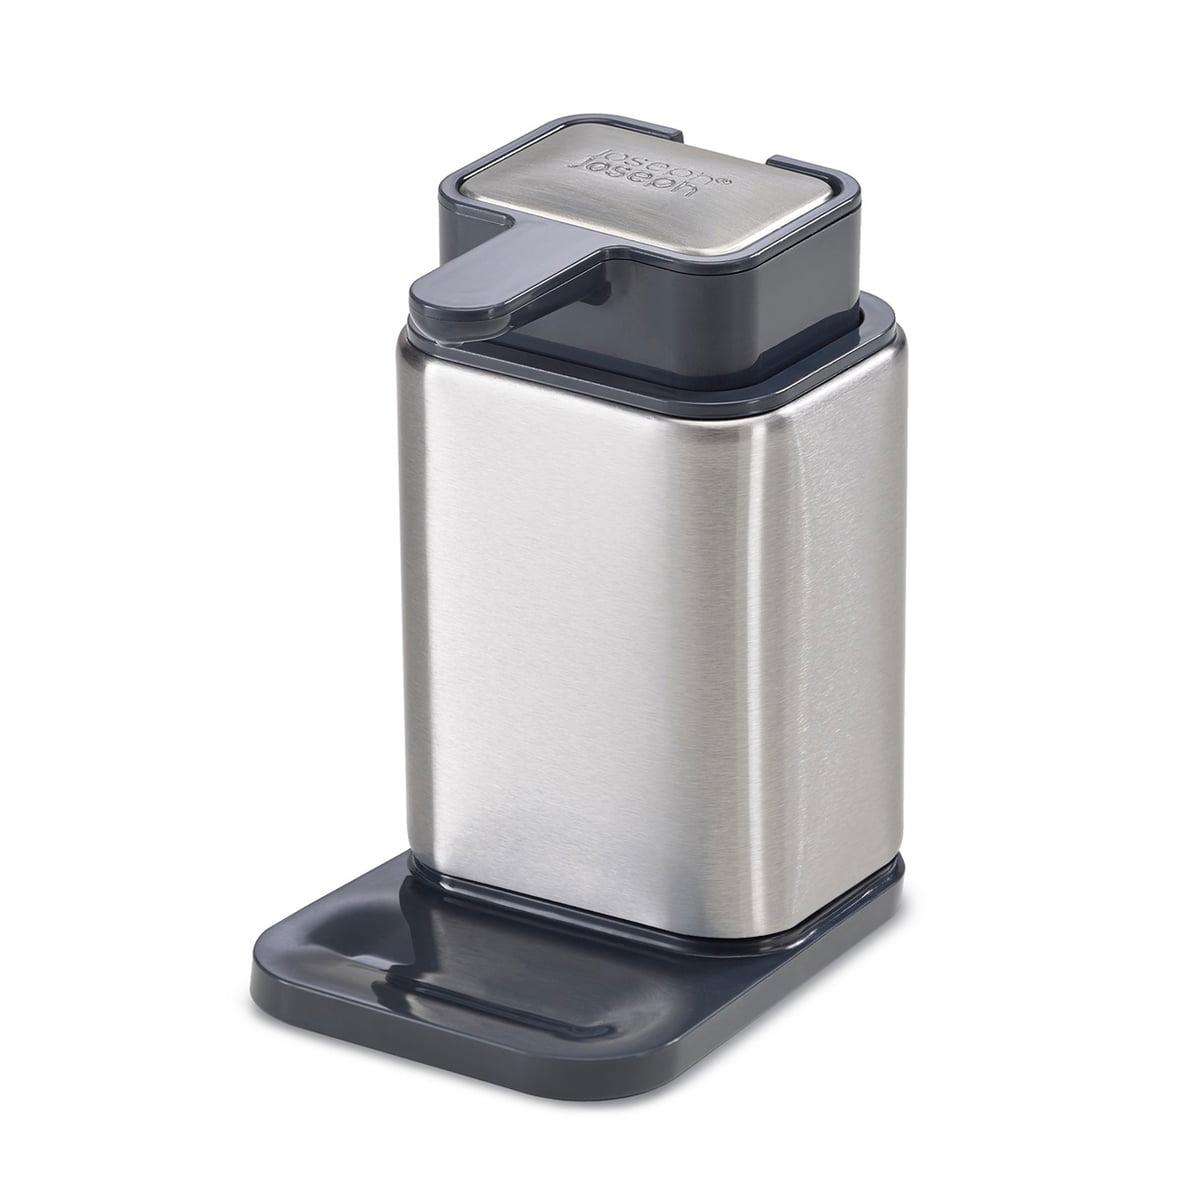 surface soap dispenser with stainless steel - surface soap dispenser with stainless steel soap by joseph joseph